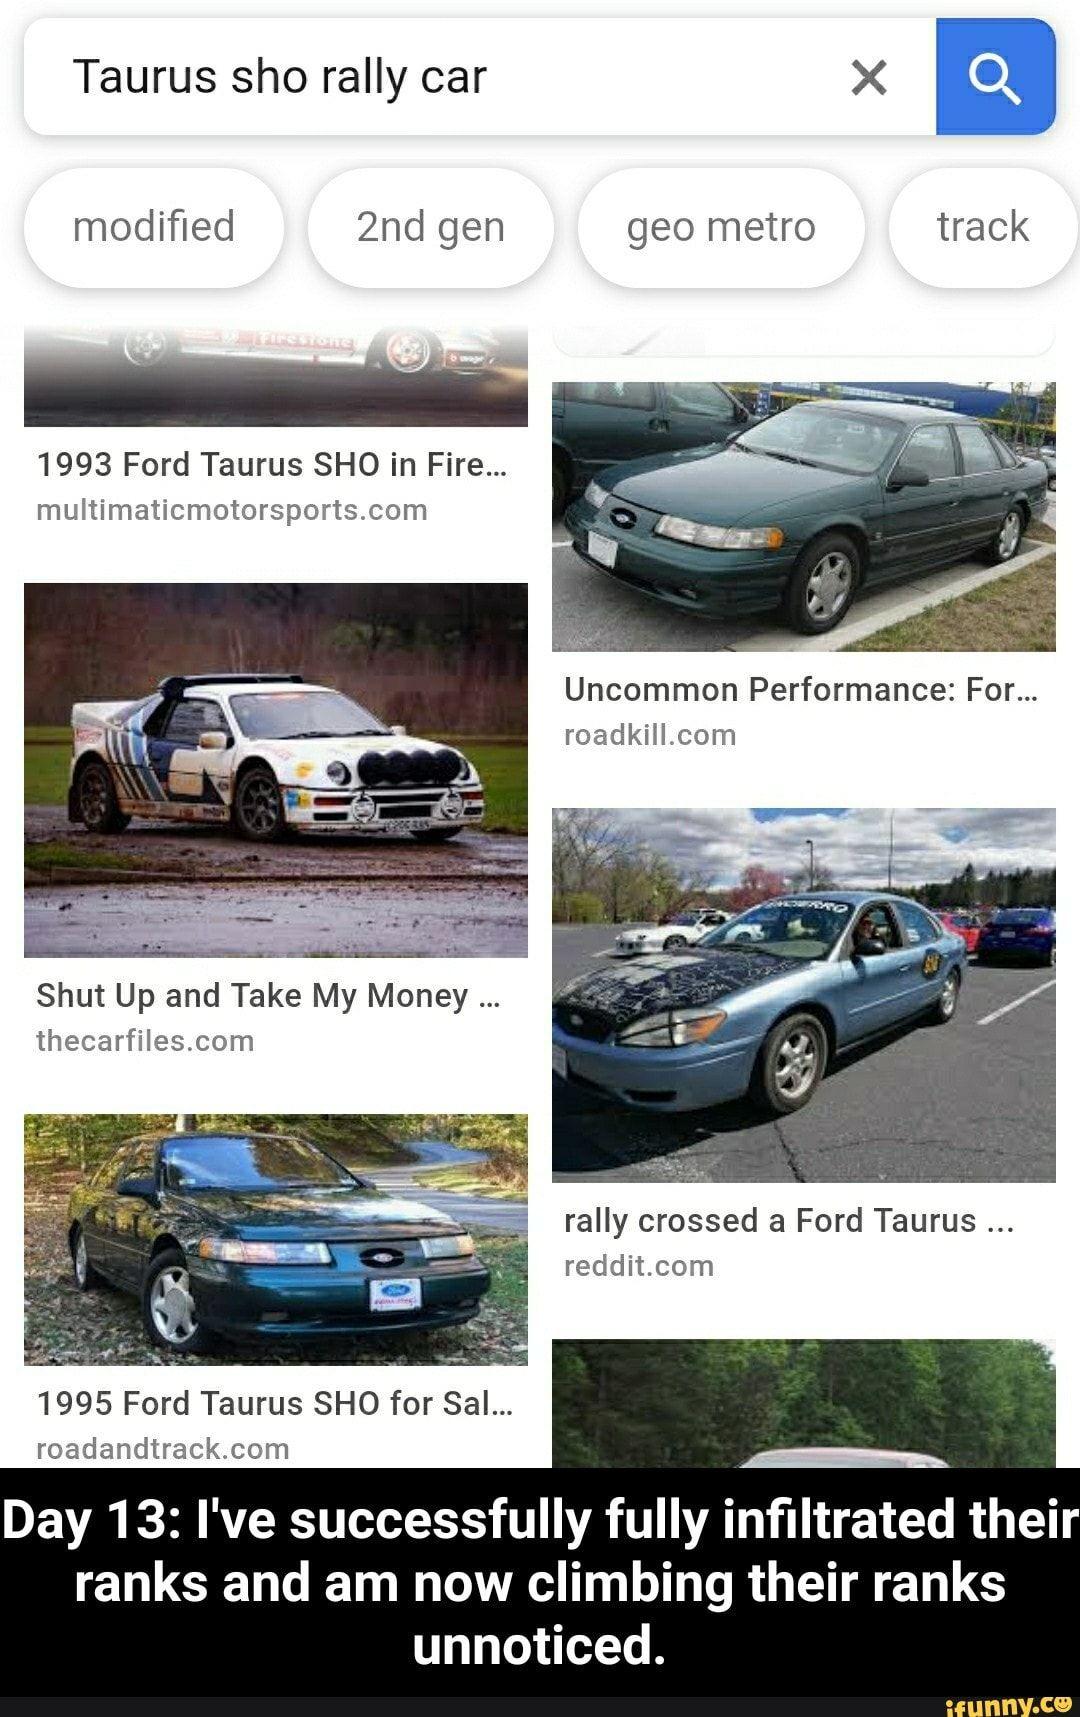 Gen Geo 1993 Ford Taurus Sho In Fire Multimaticmotorsports Com